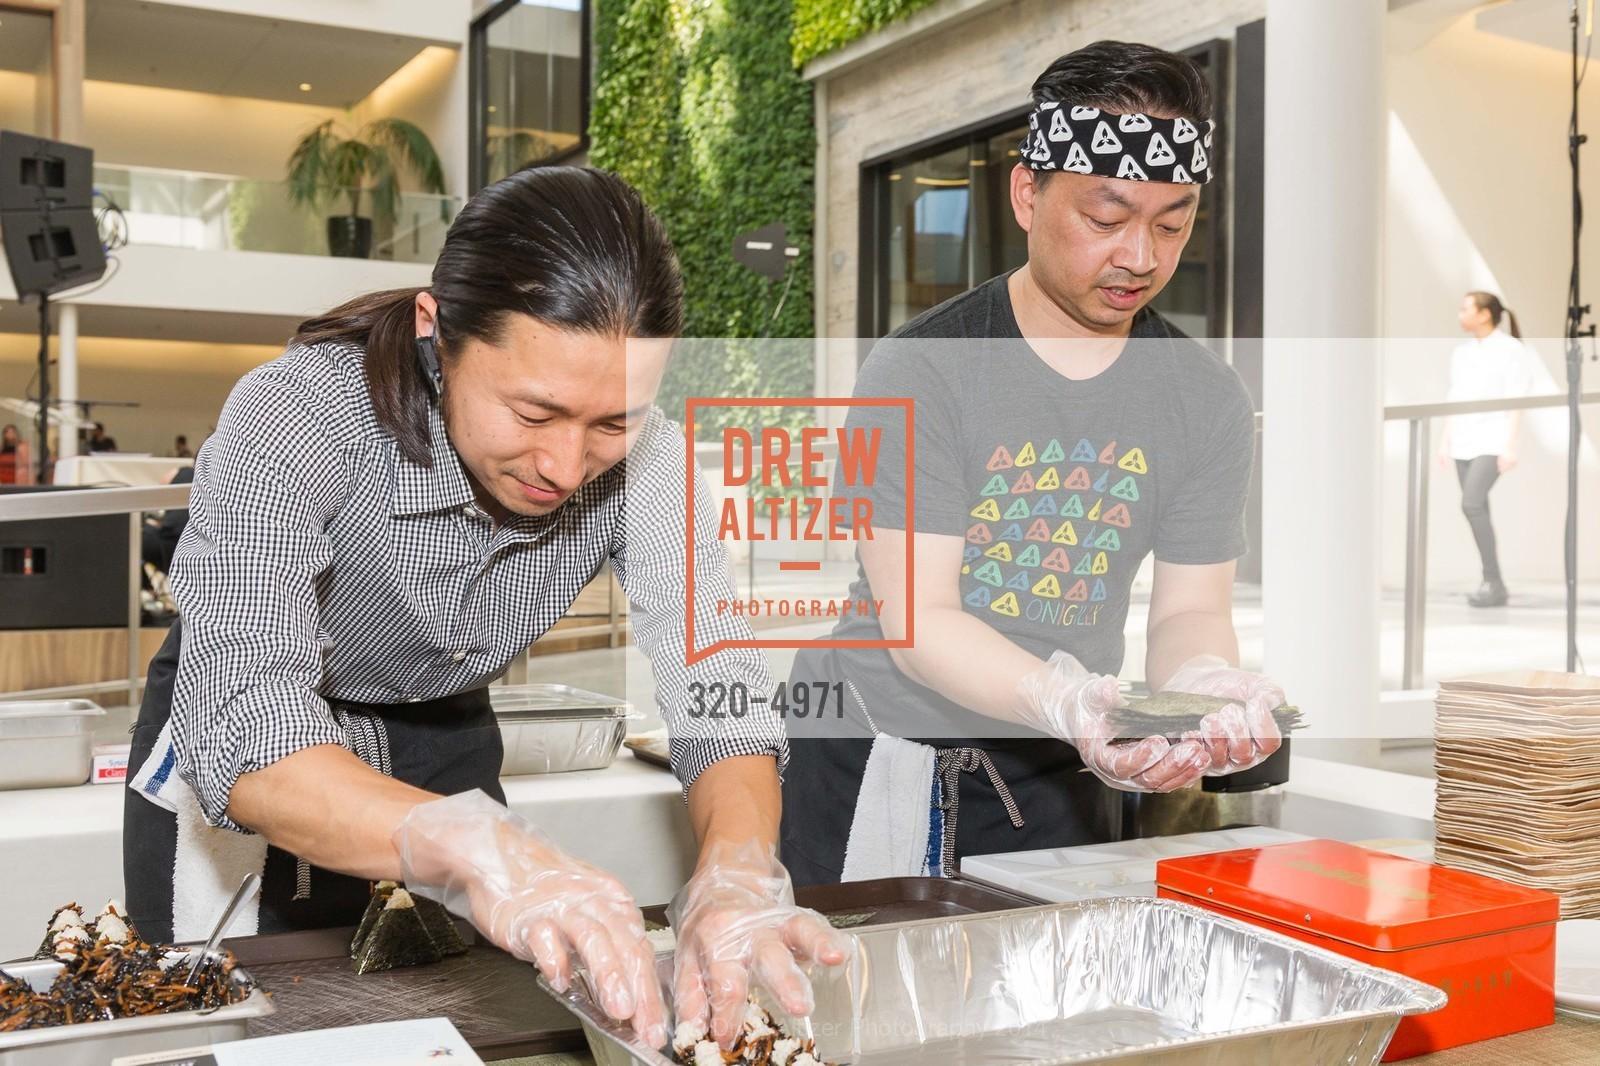 Koji Kanematsu, Steven Jee, Photo #320-4971